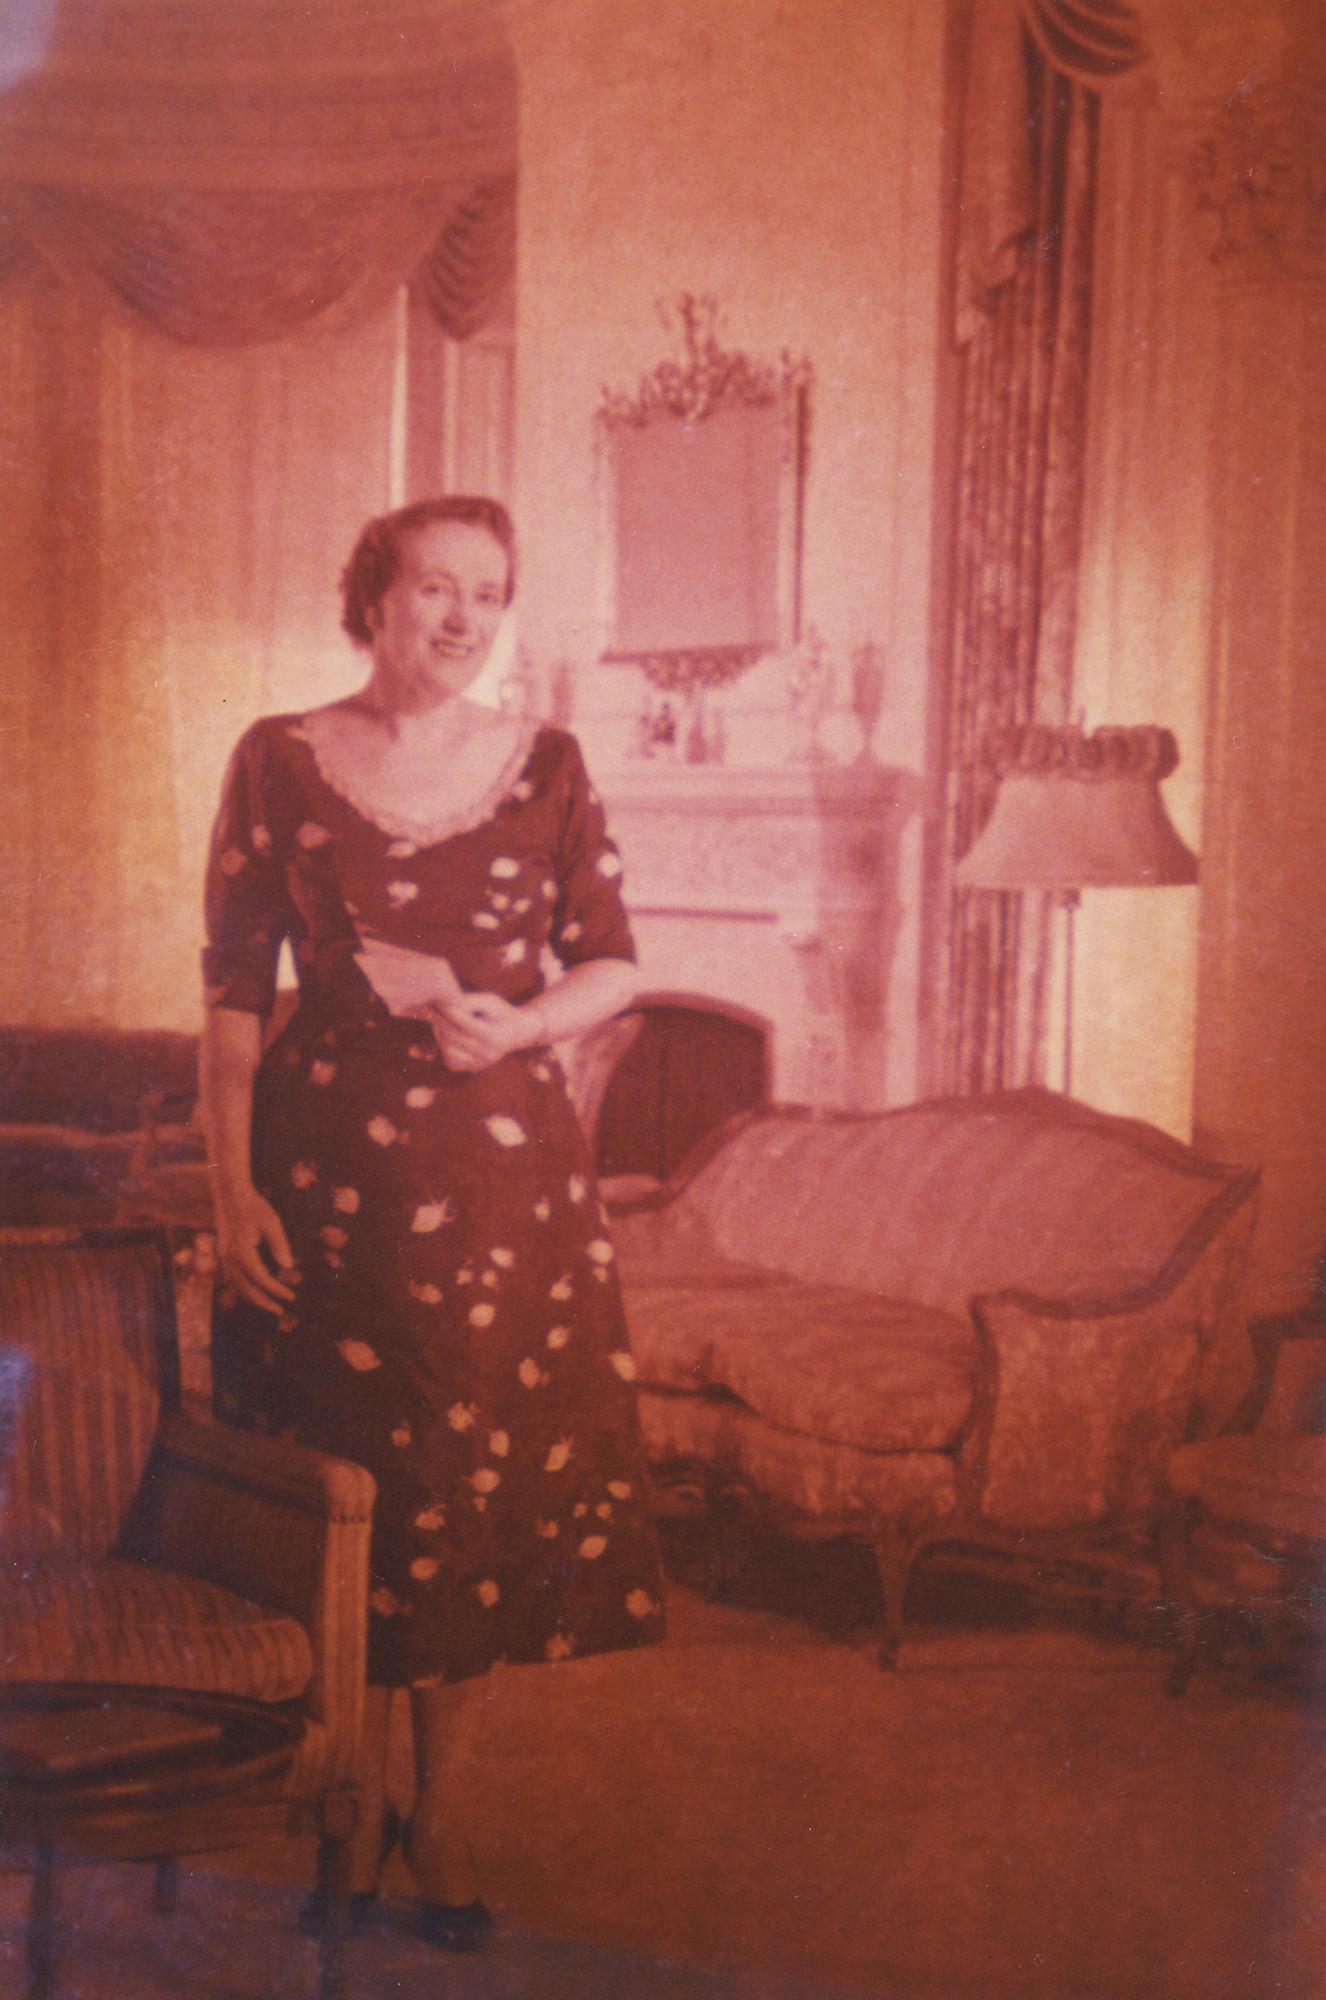 Images courtesy Utah State Historical Society, Jon Lee Taylor, Salt Lake Tribune.